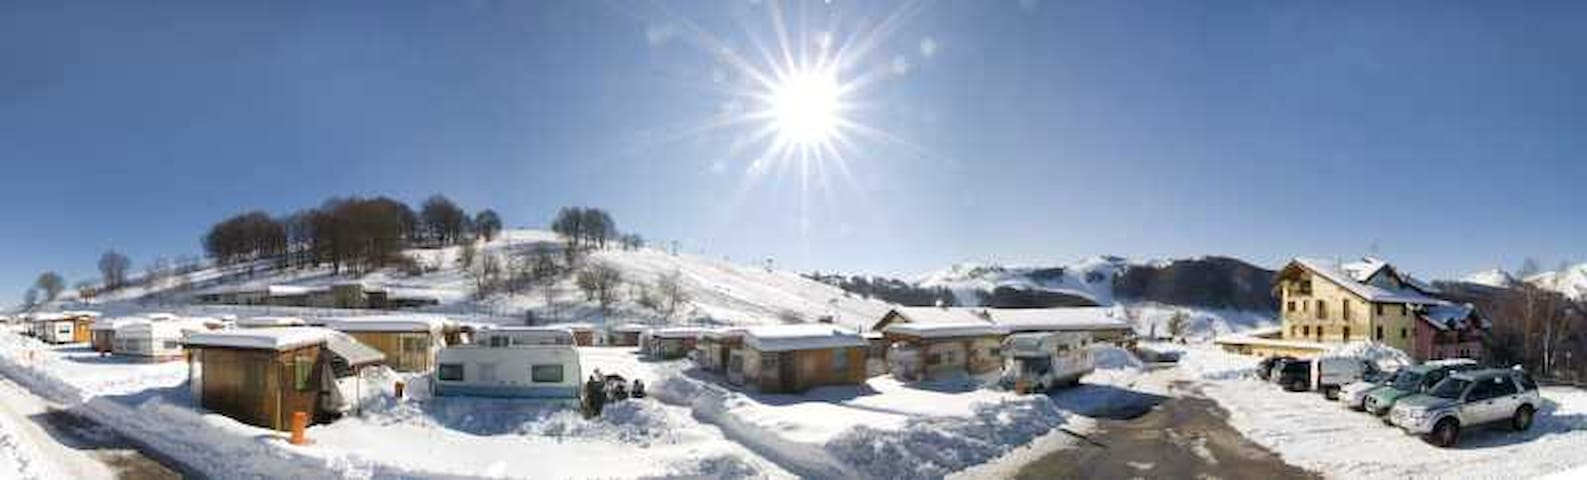 Piazzola in camping per camper e roulotte - Brentonico - Otros